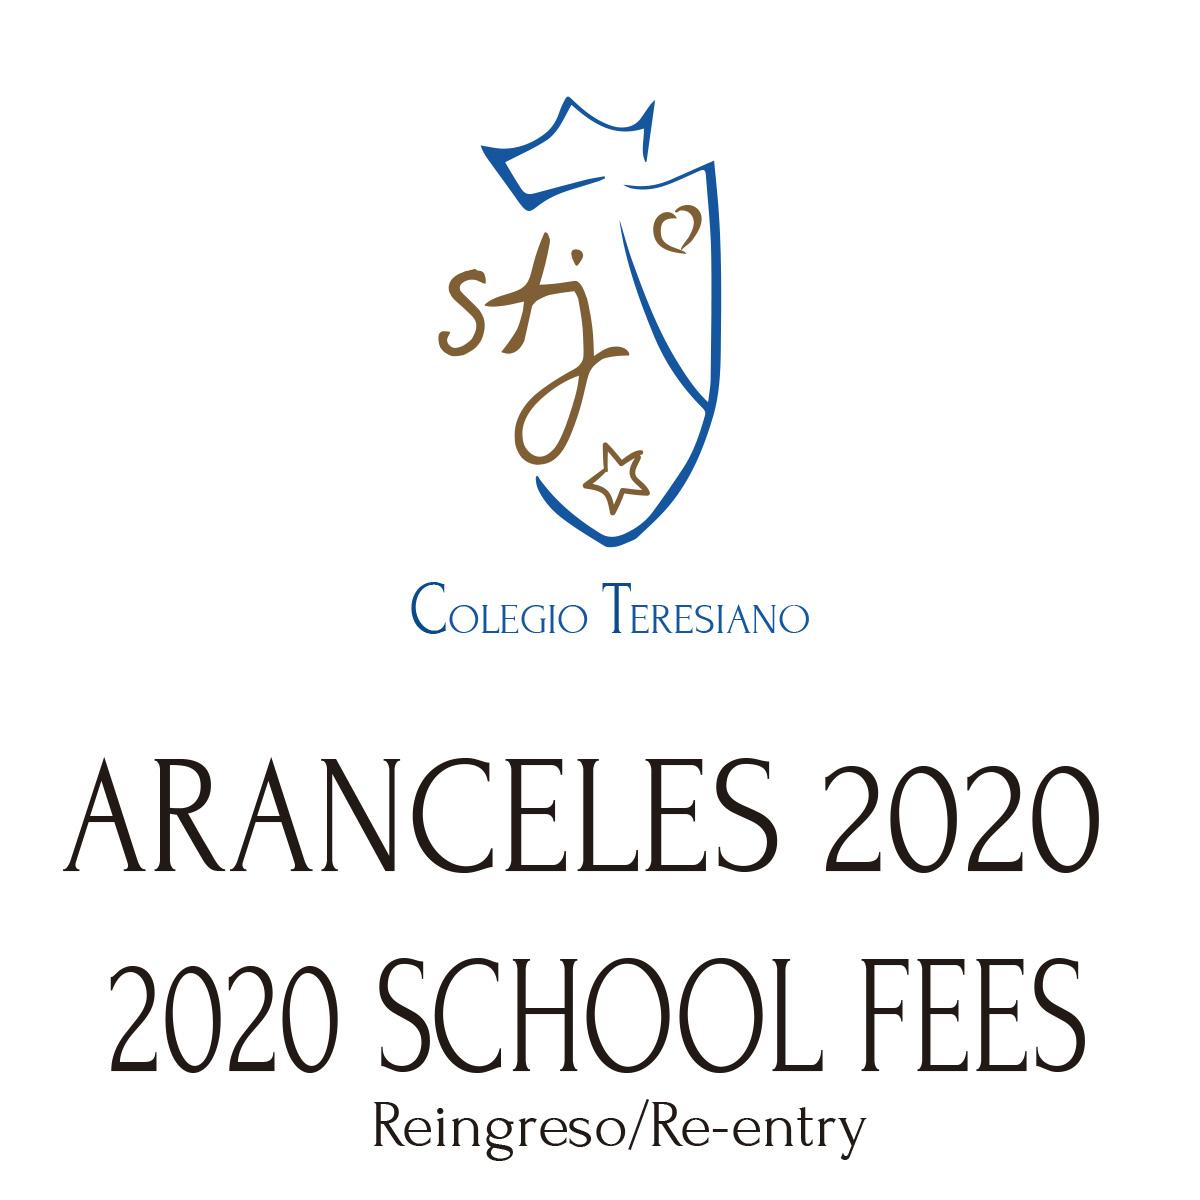 ARANCELES 2020 –  REINGRESO